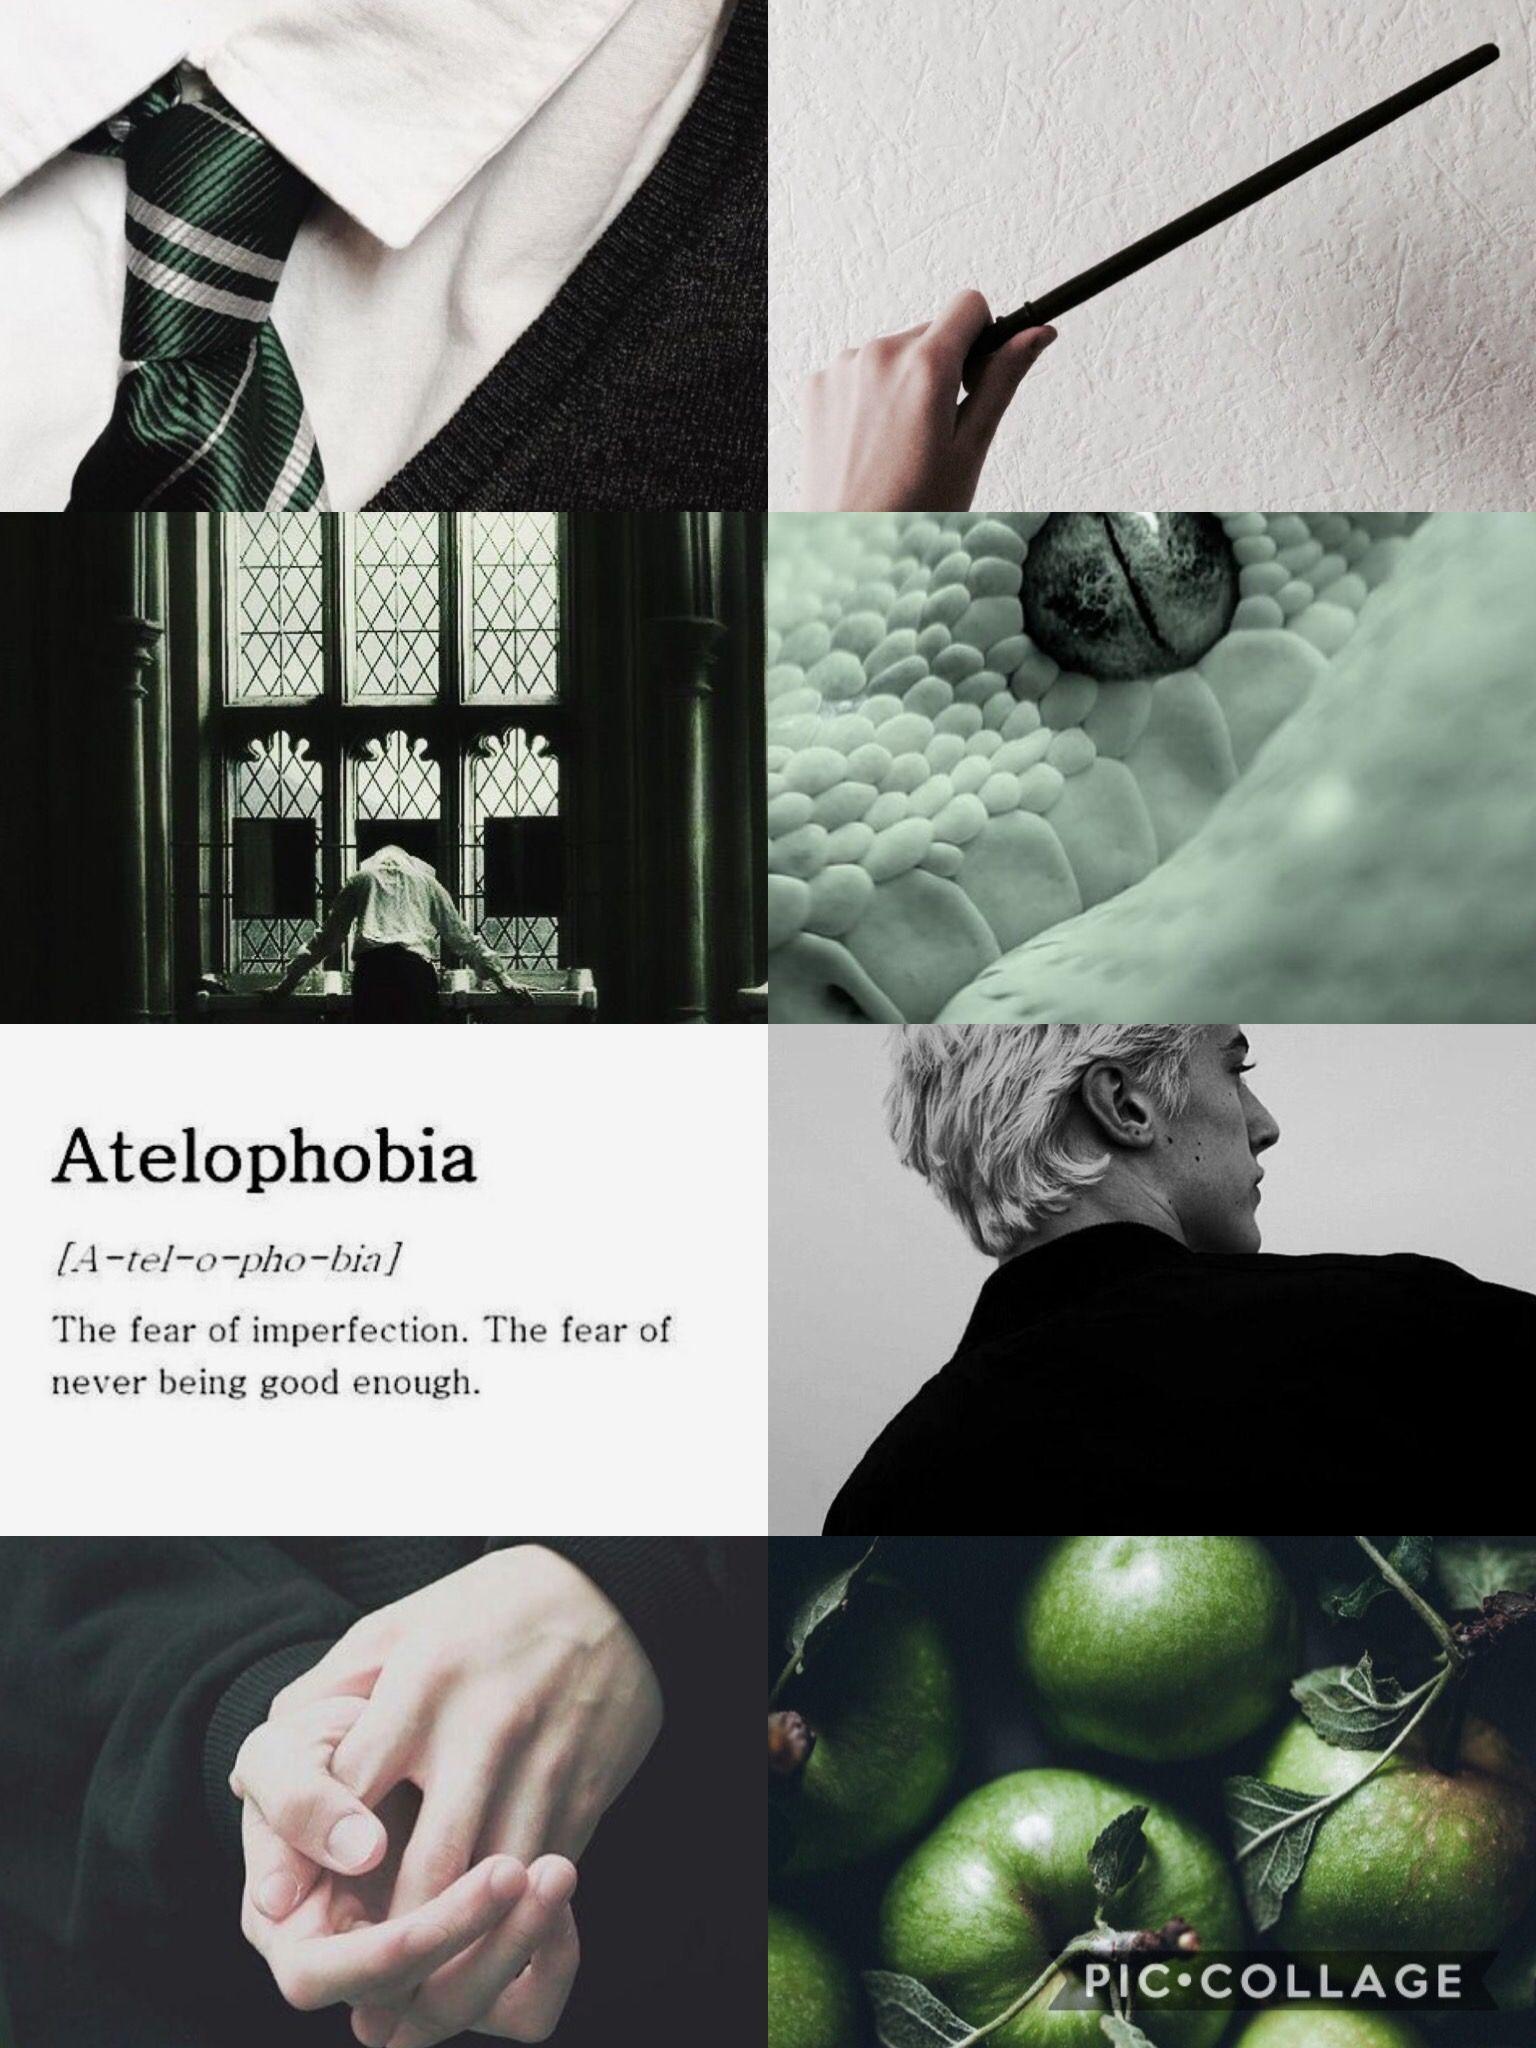 Draco Malfoy Aesthetic Slytherinaesthetic Slytherin